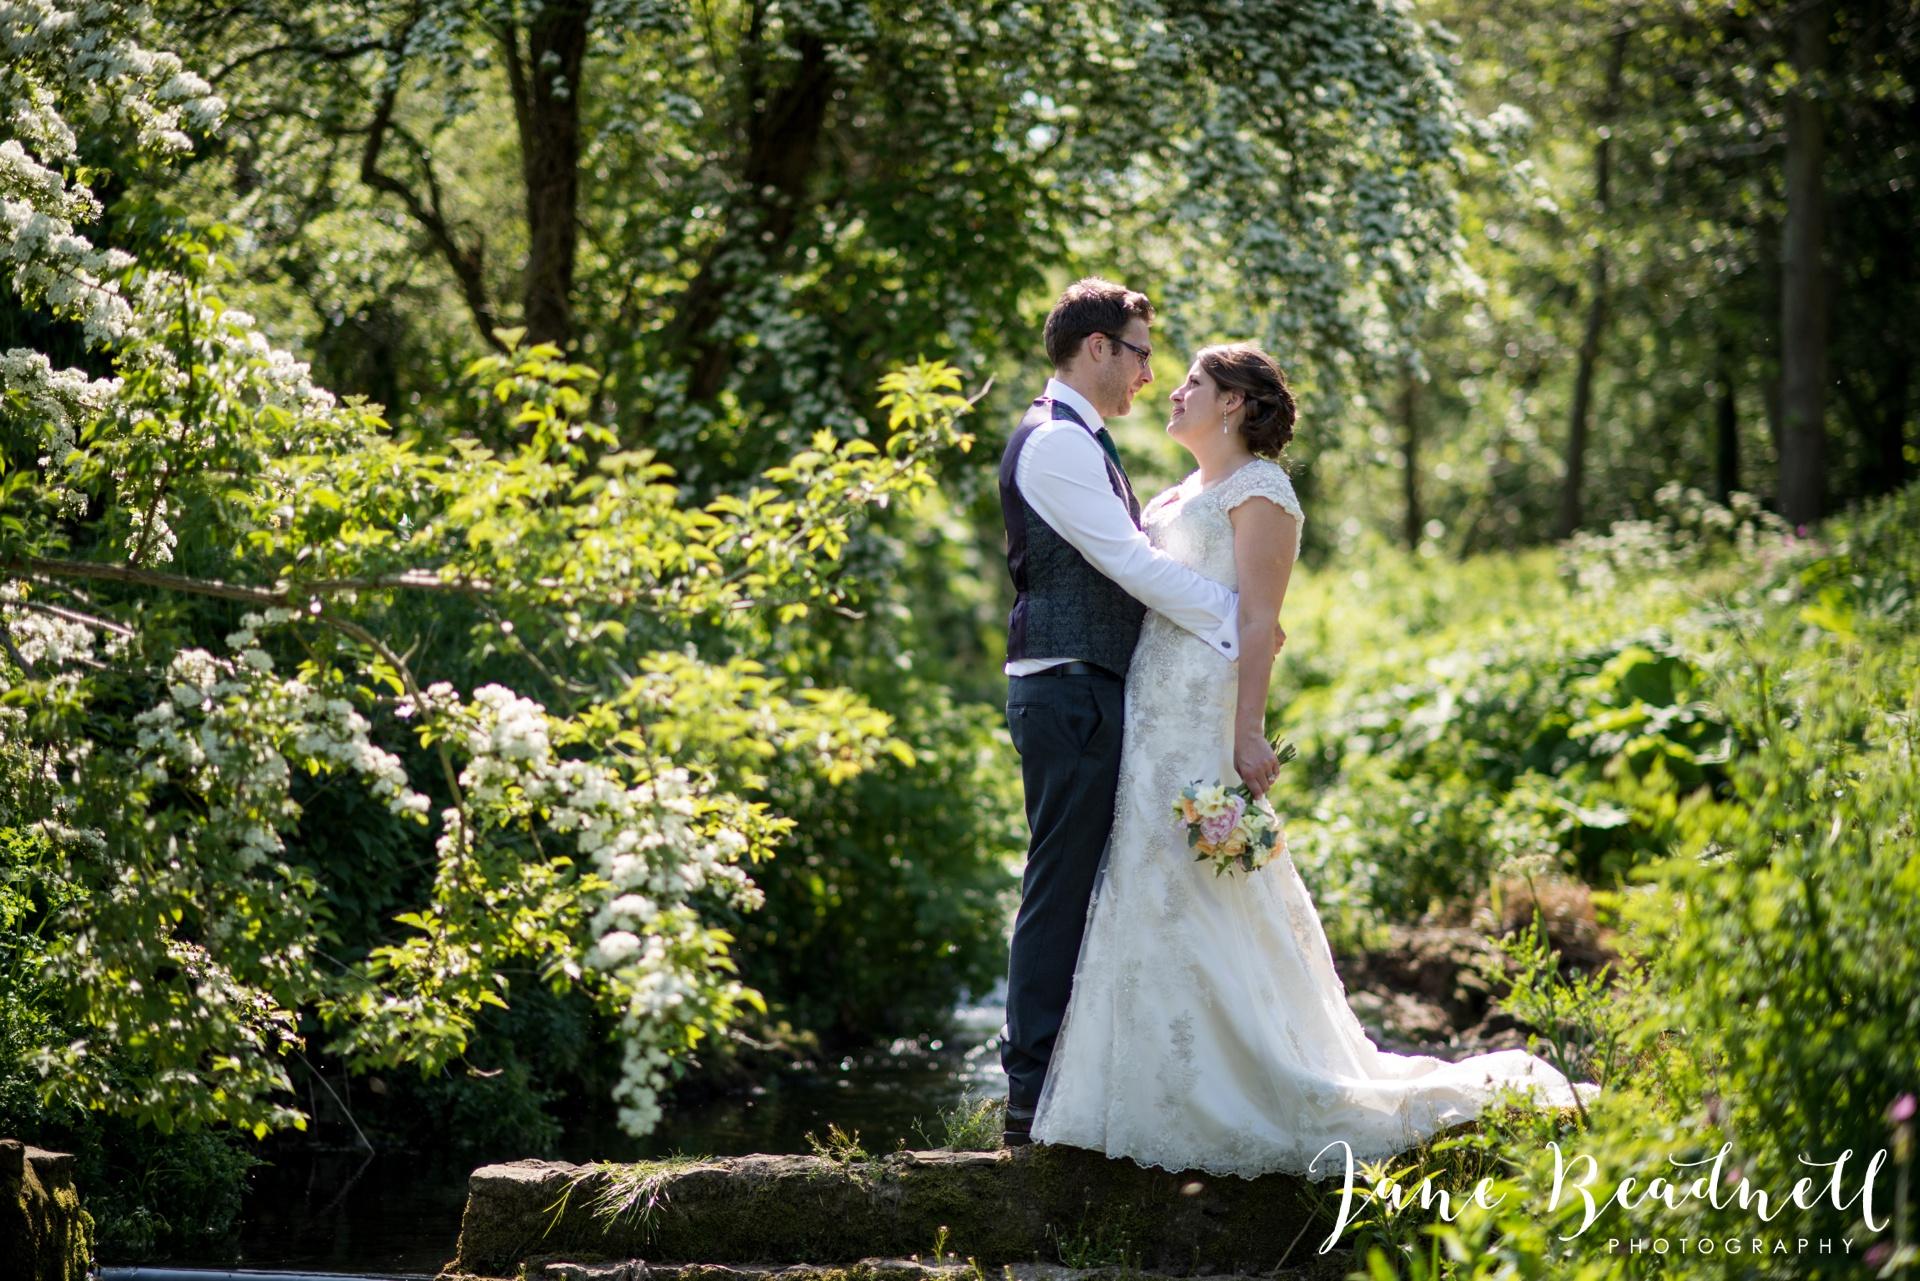 Bath Abbey wedding photography by fine art wedding photographer Leeds Jane Beadnell_42